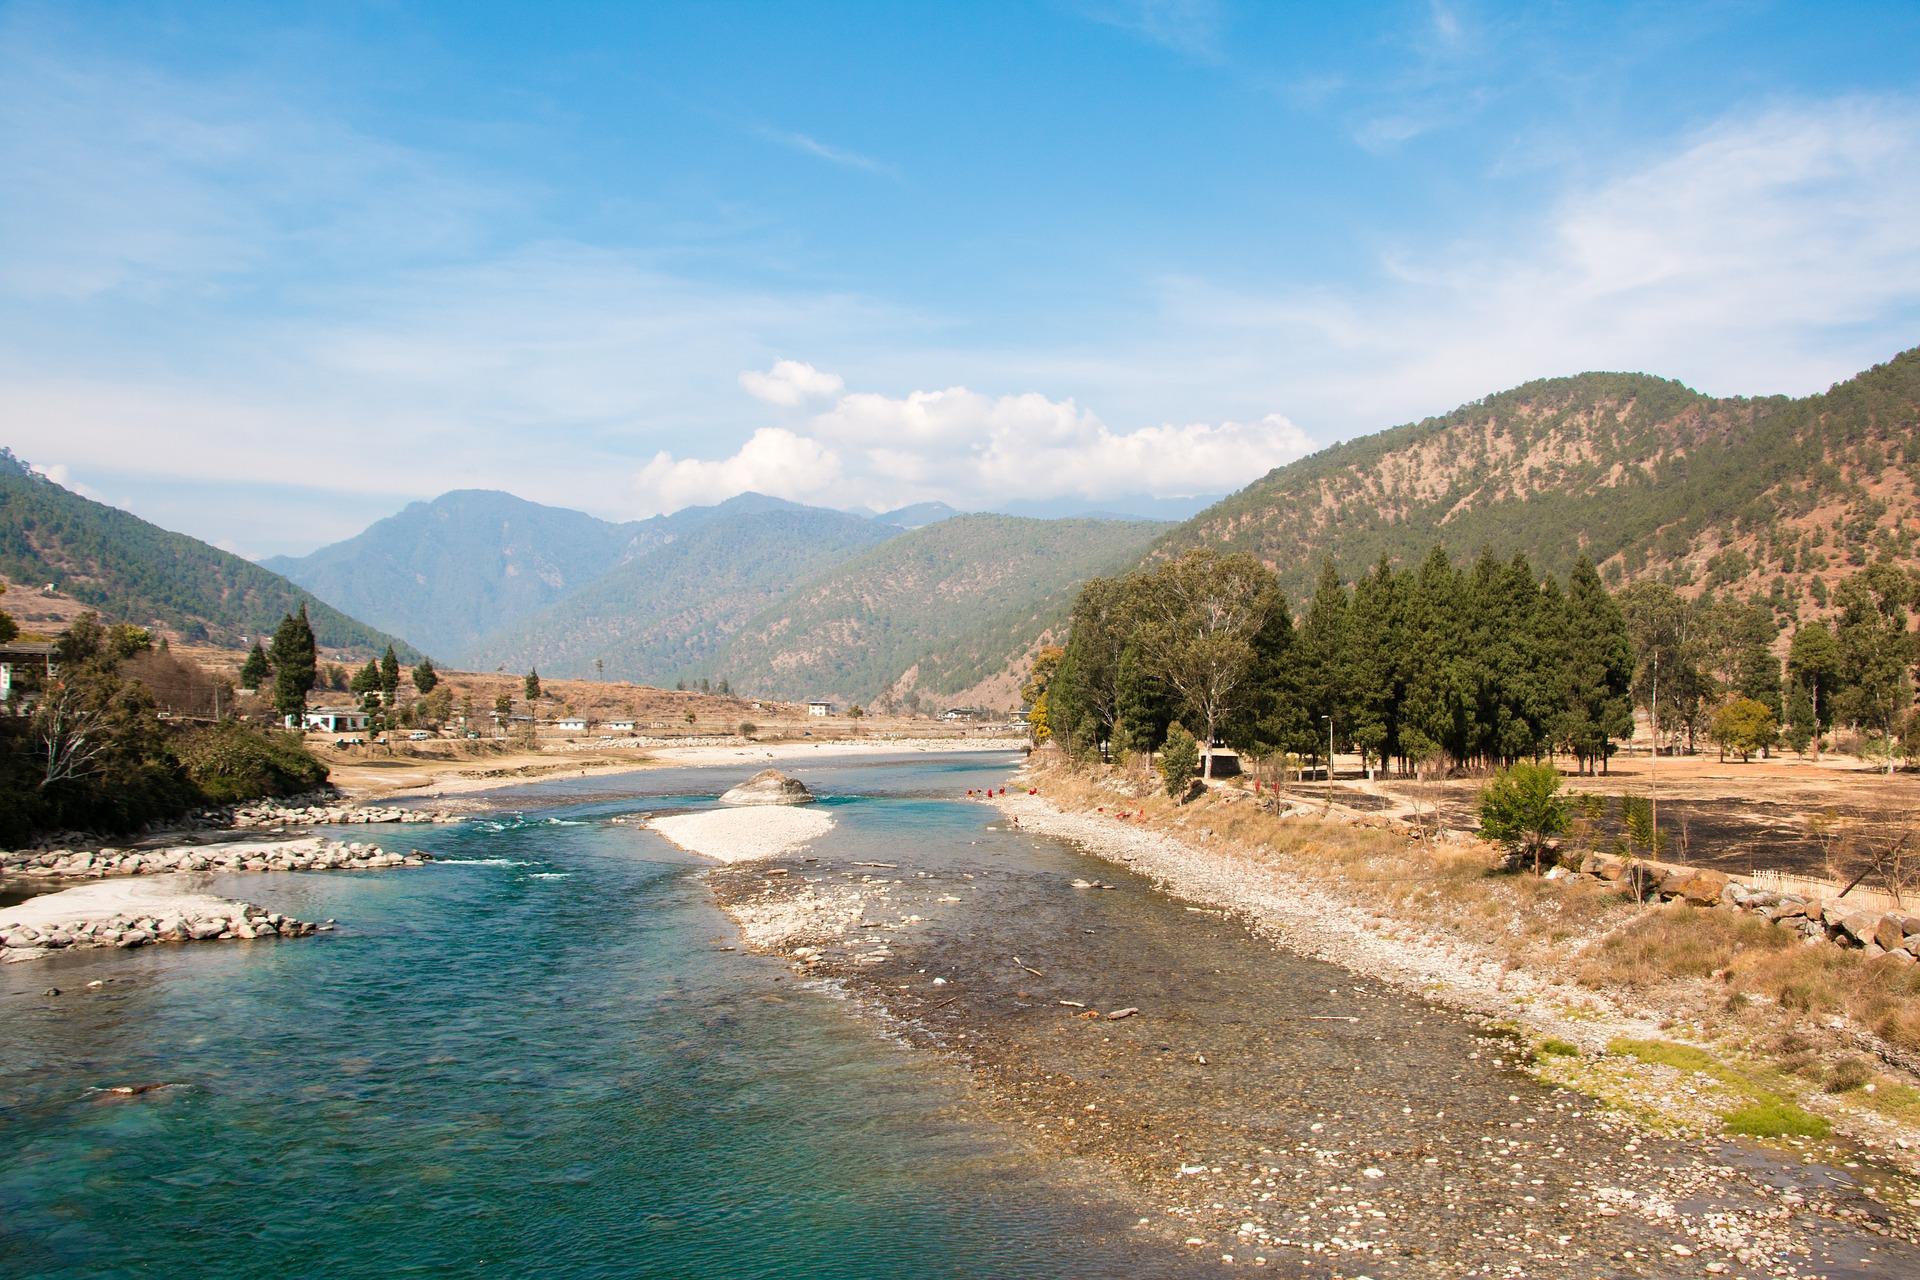 The Land of the Thunder Dragon, Bhutan